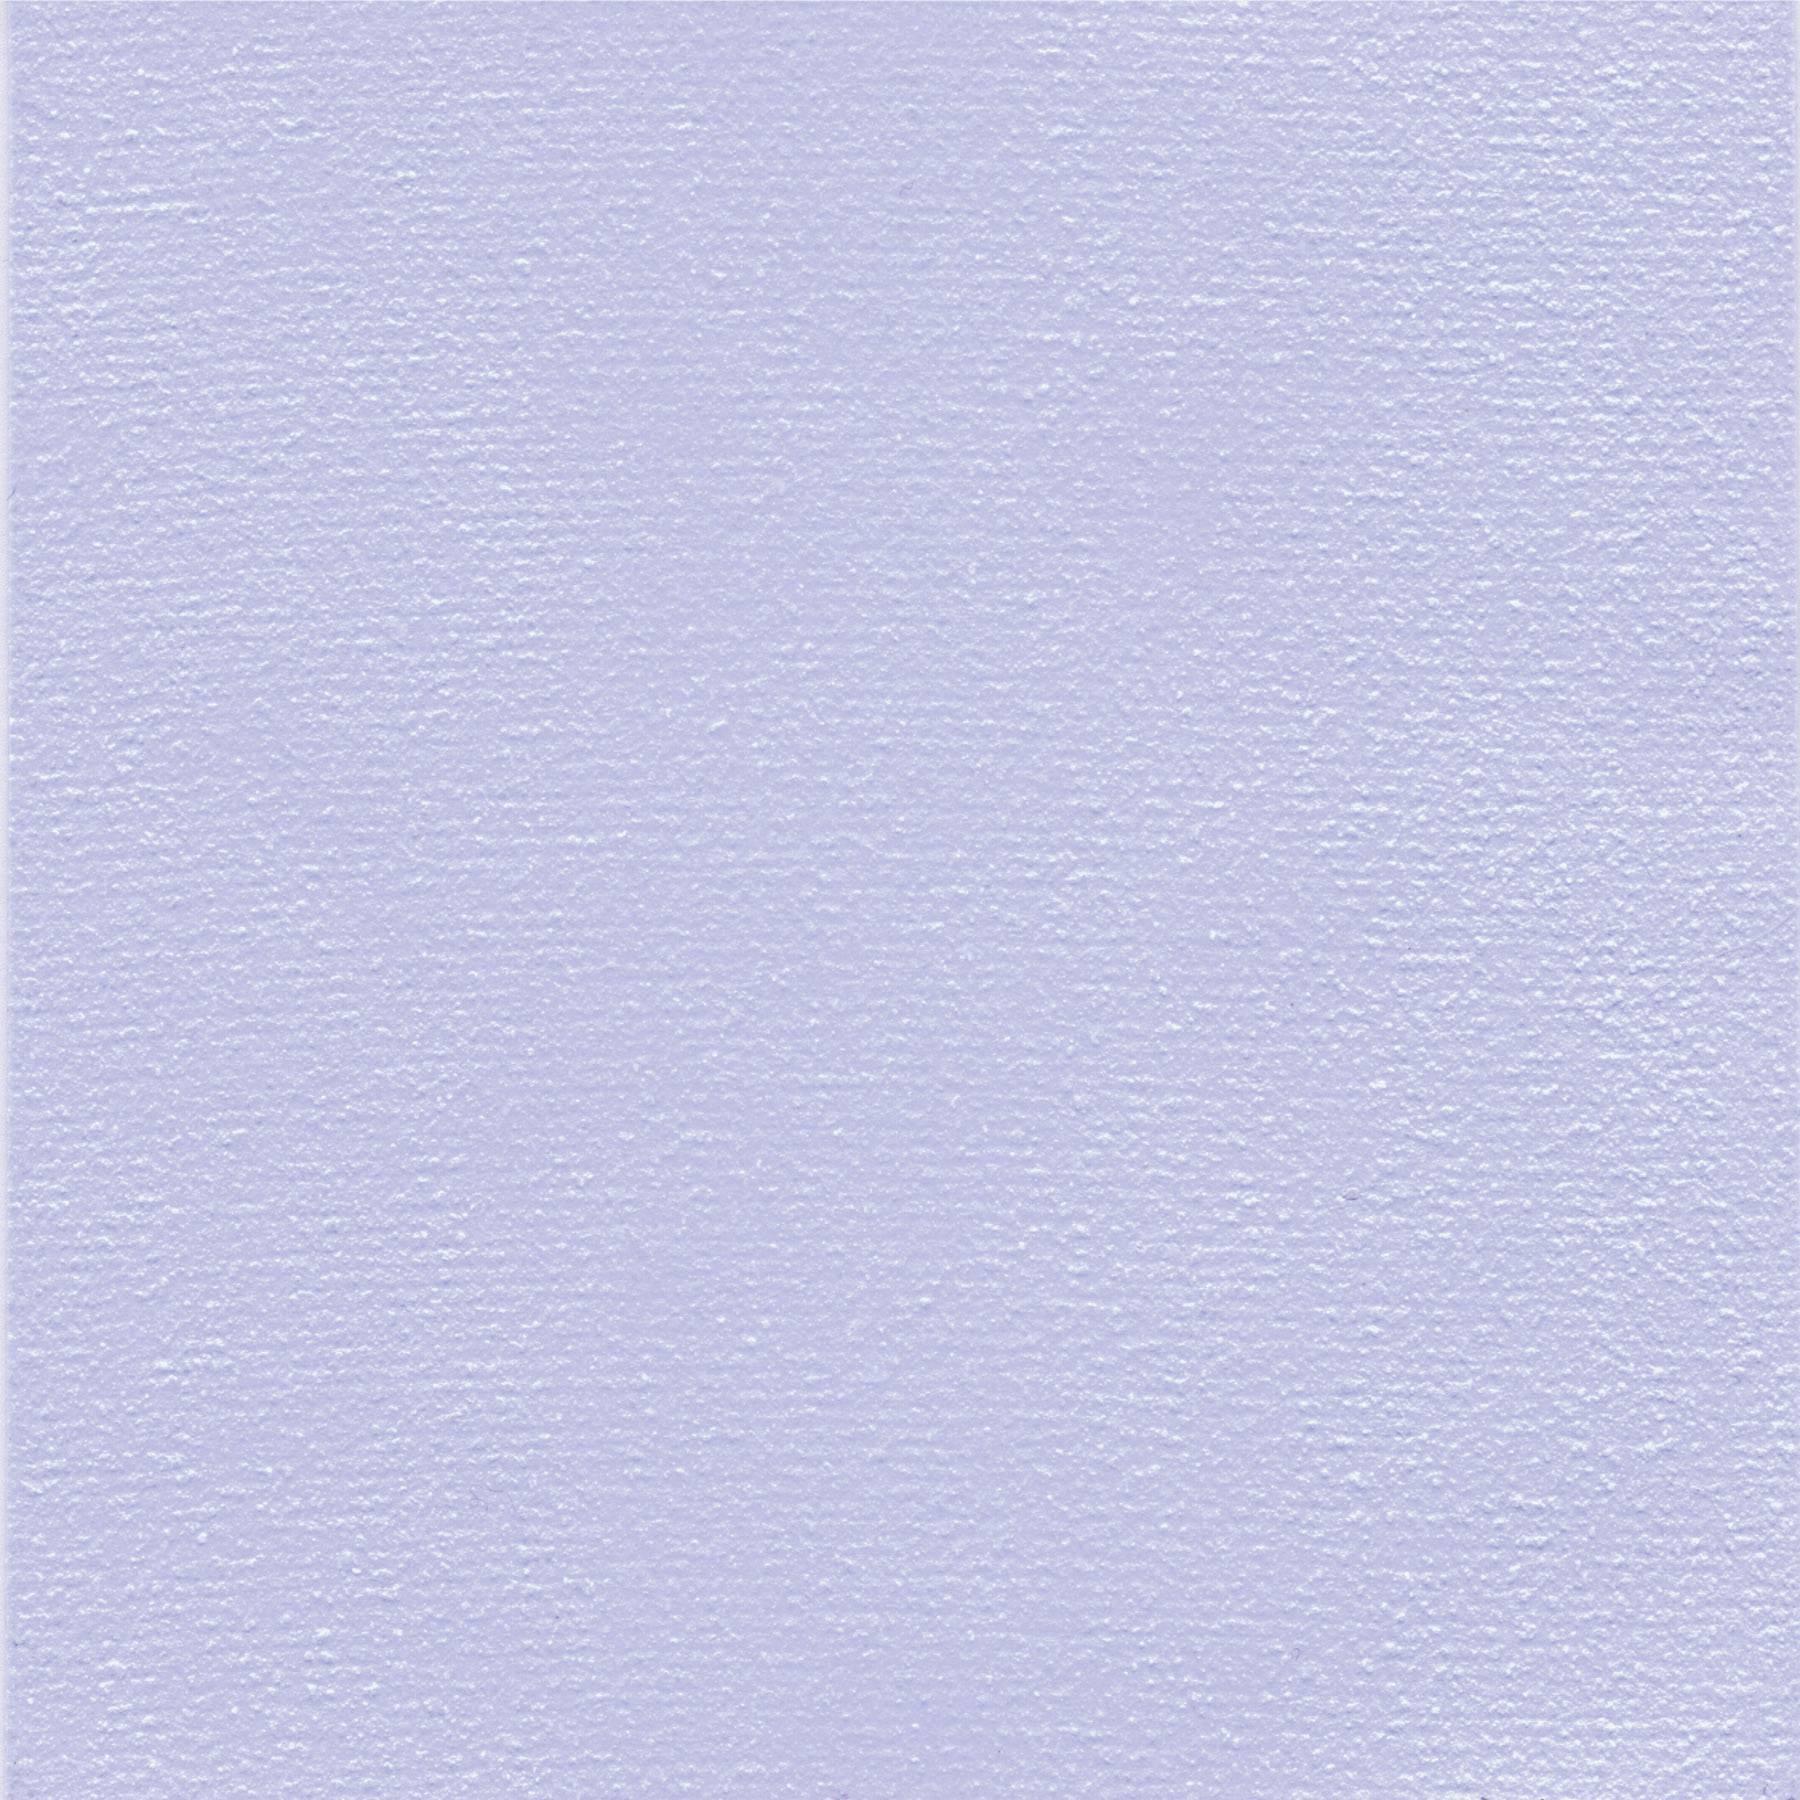 Teplovodivá fólie Kerafol 86/300, 100 x 100 x 2 mm, modrá